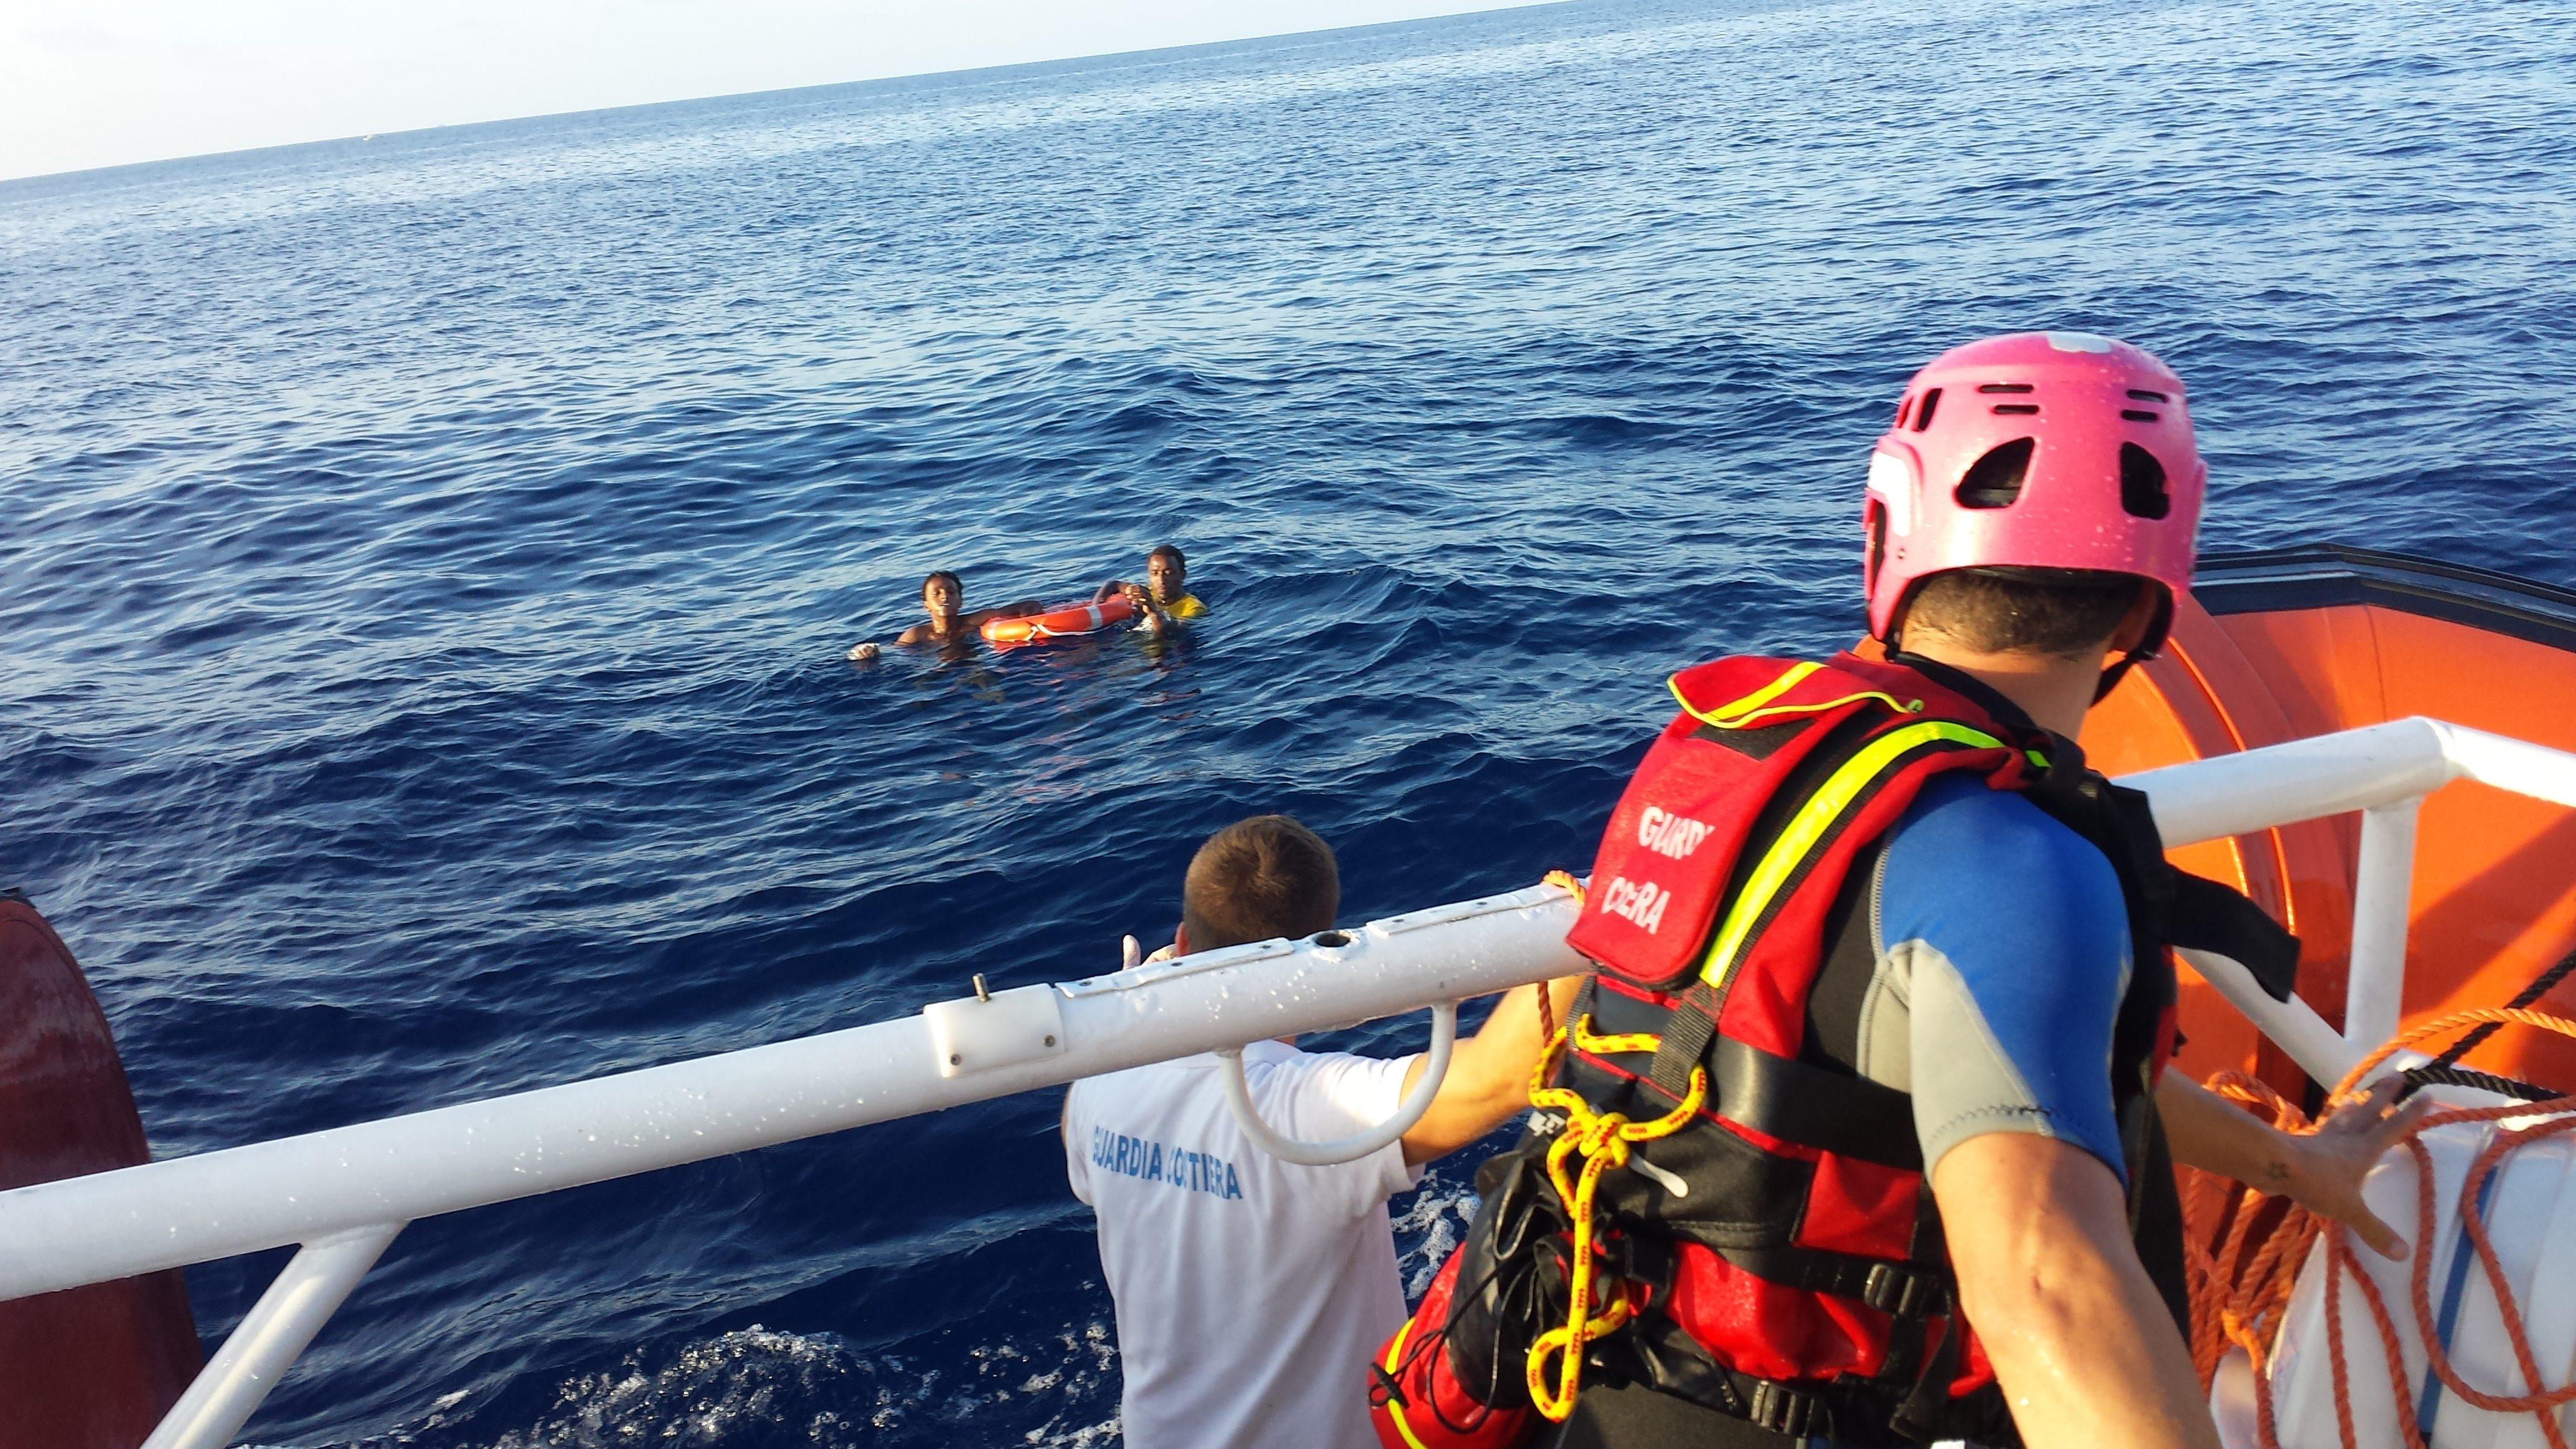 Flüchtlinge werden vor Lampedusa aus dem Meer gerettet.